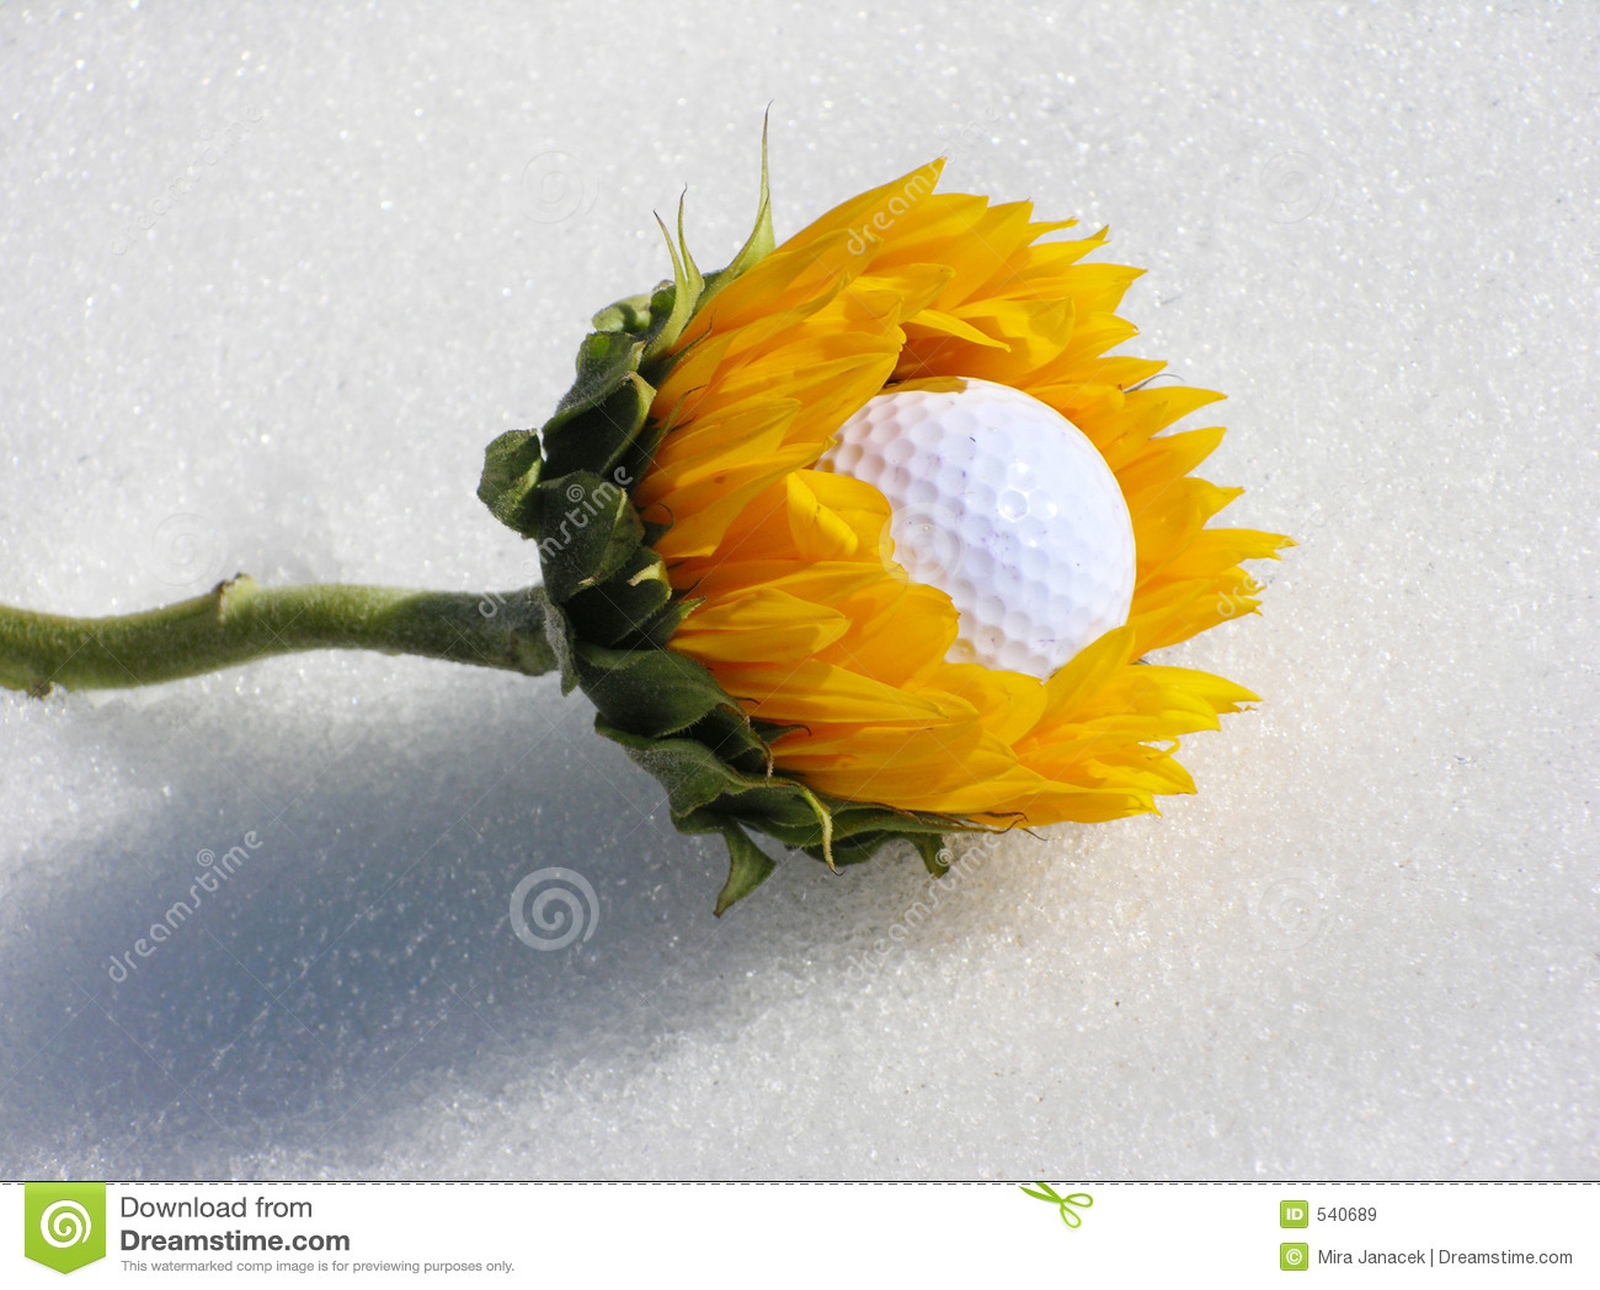 Comedor da esfera de golfe